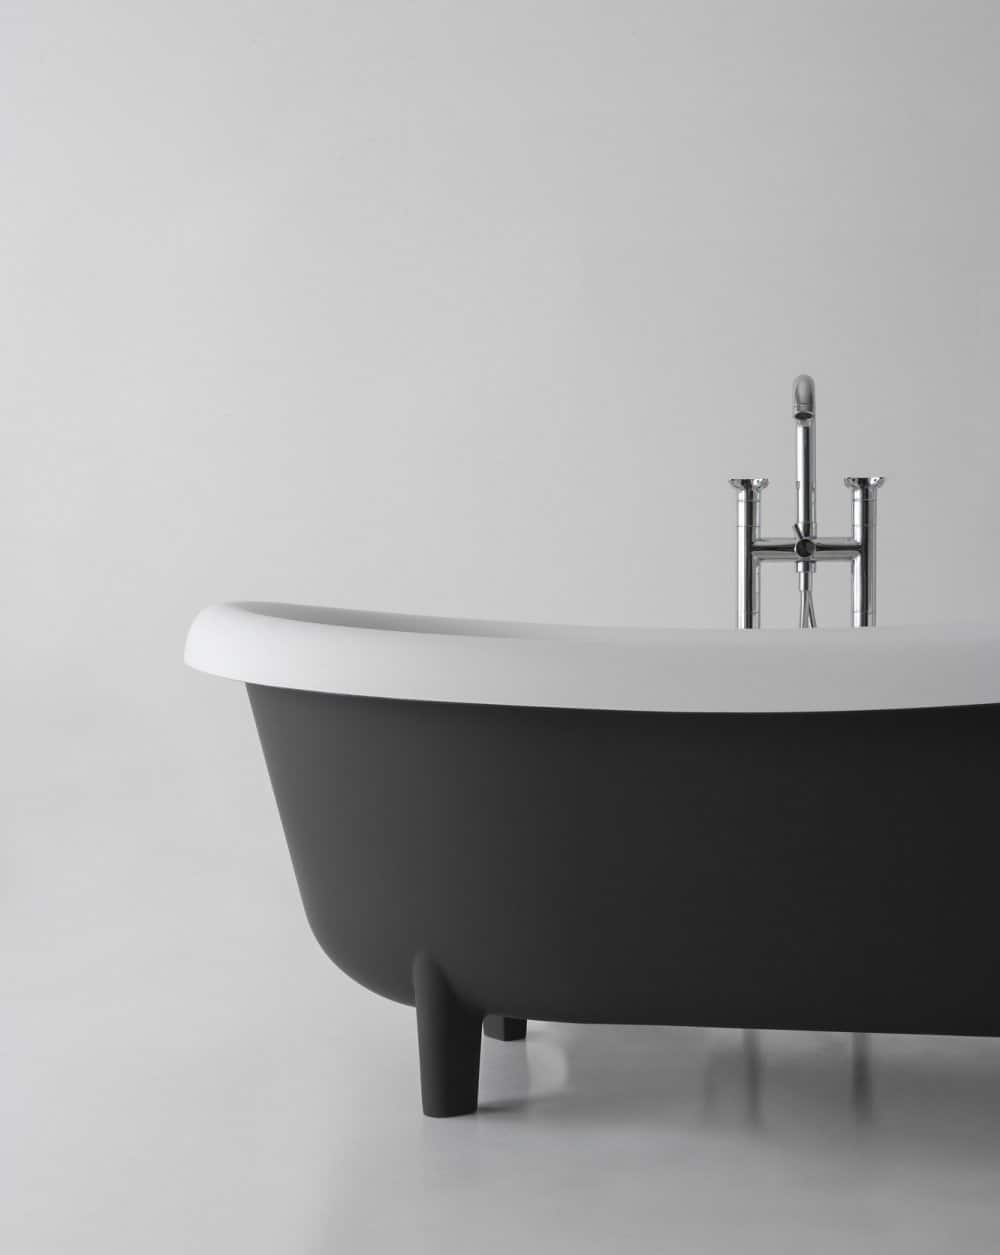 Retro Modern Free Standing Tub By Antonio Lupi